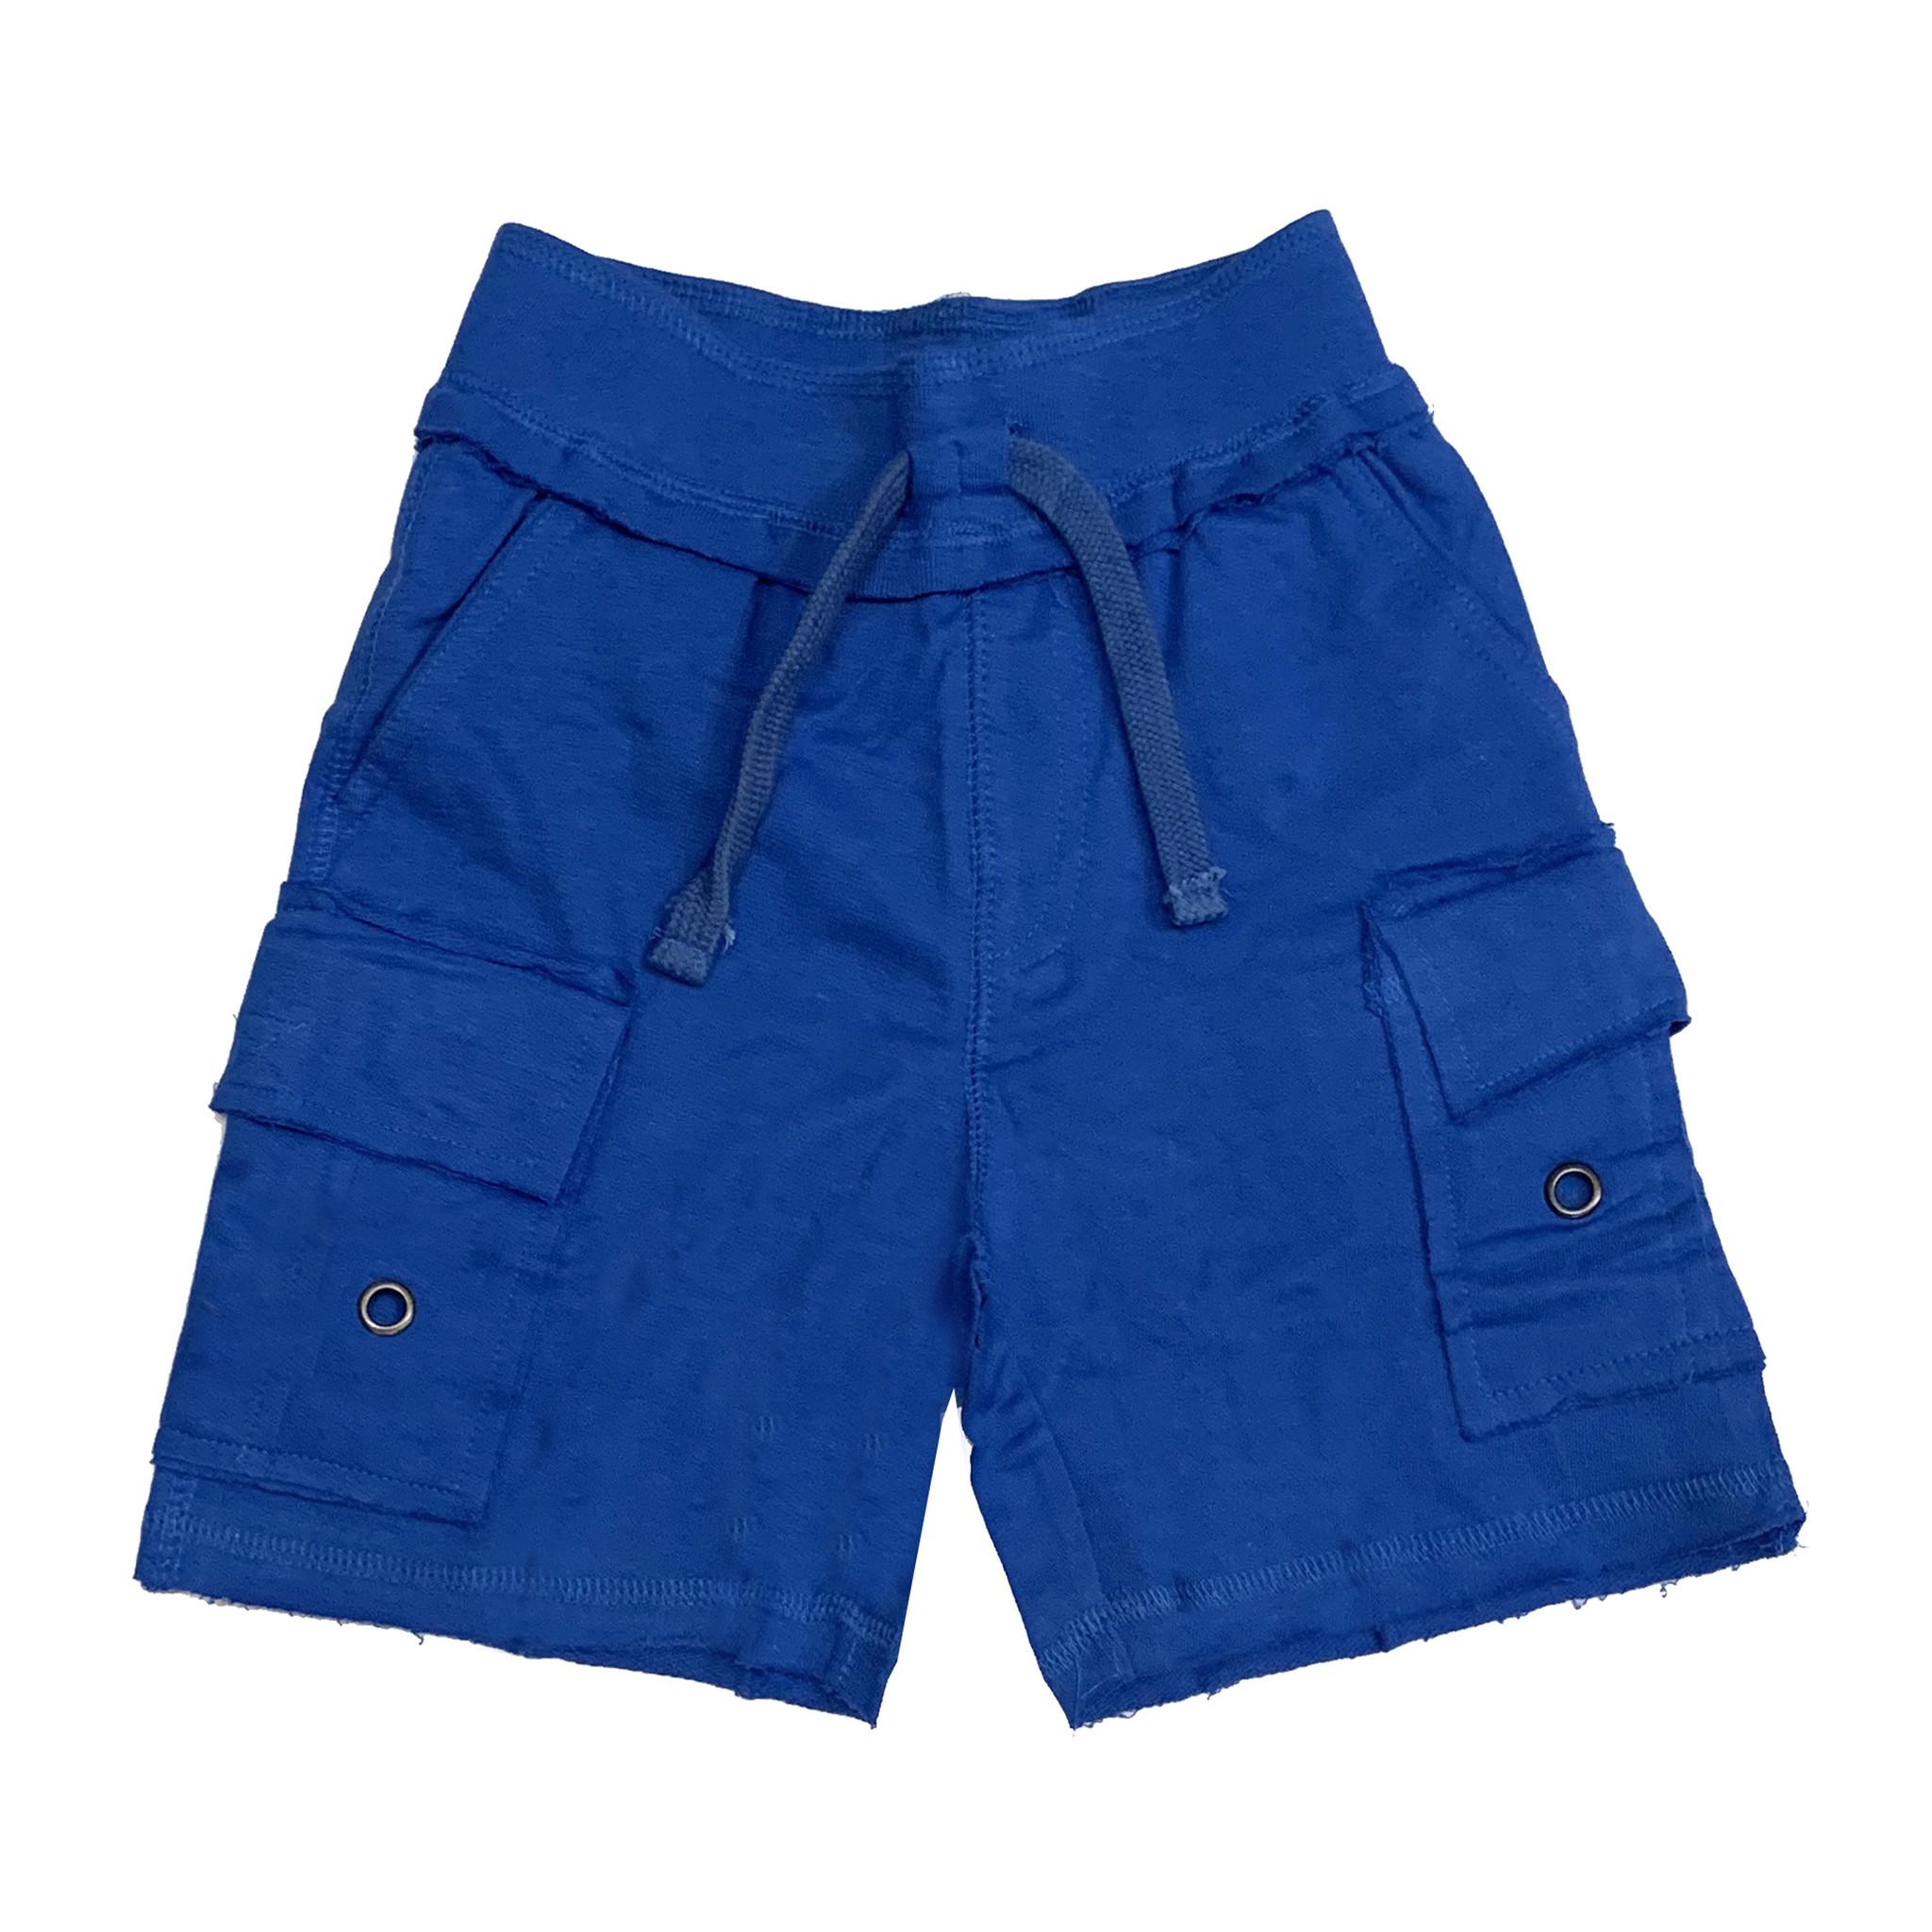 Mish Solid Cobalt Cargo Shorts